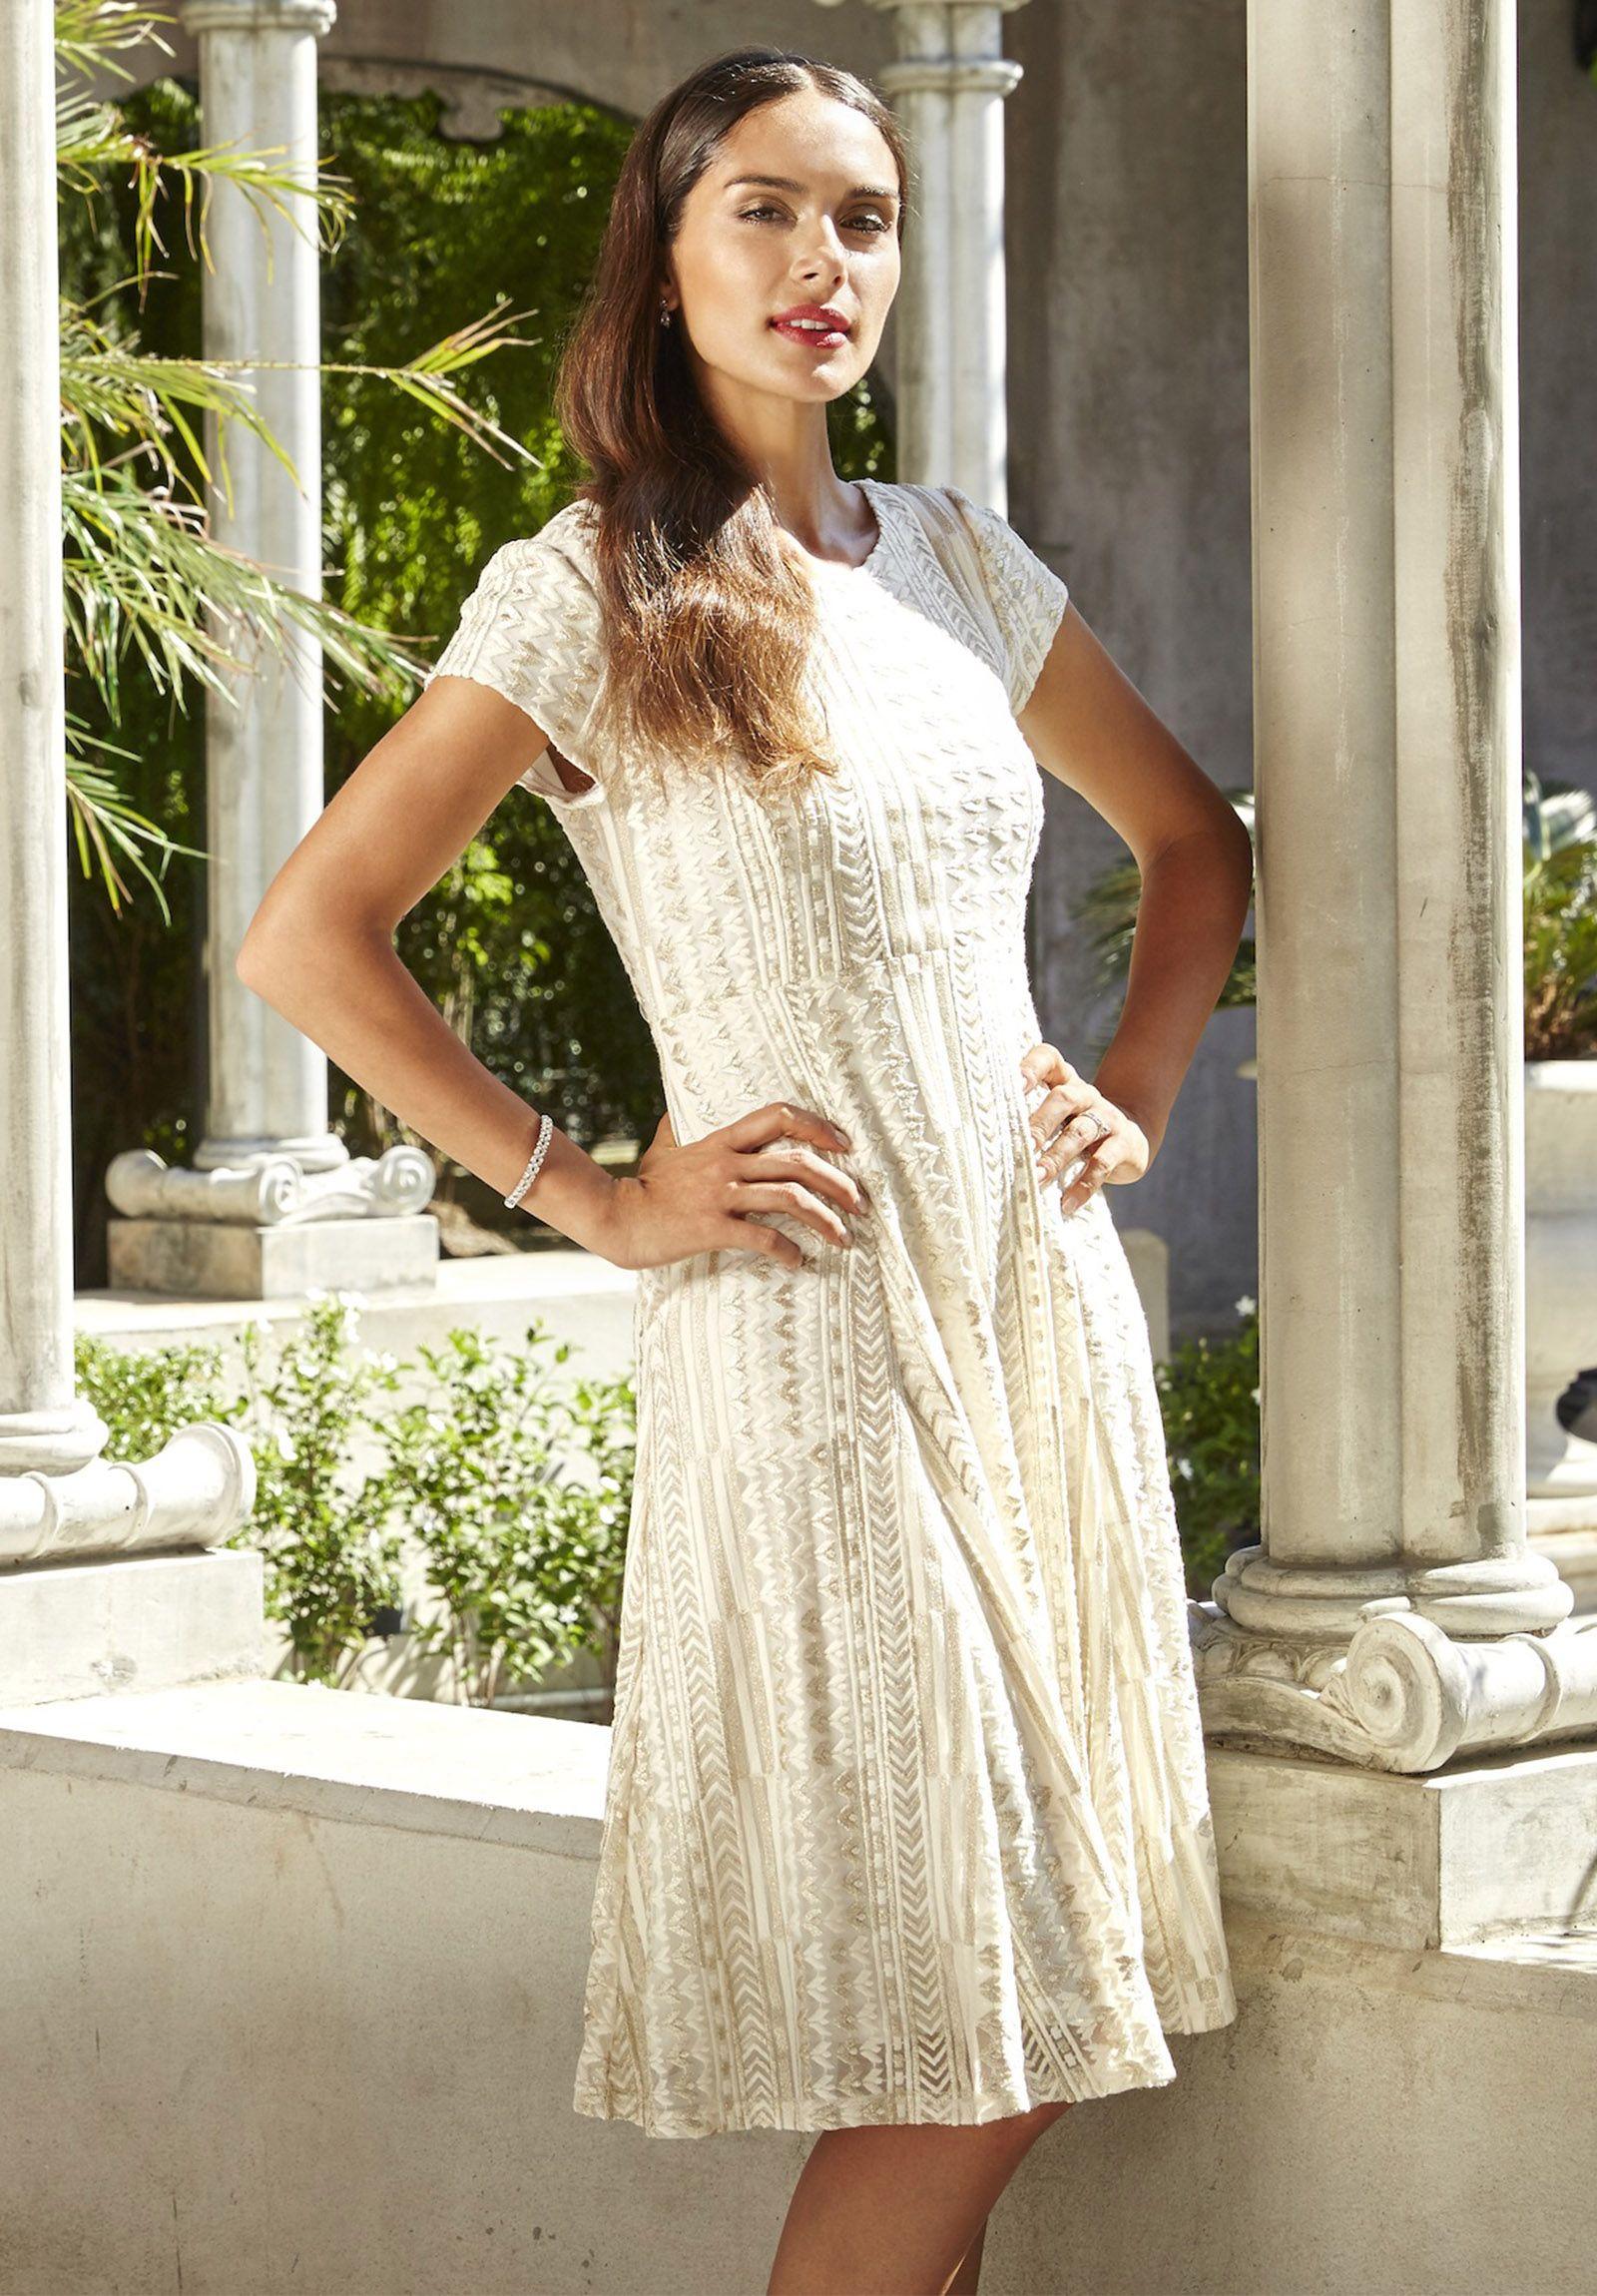 65fb4eb5f09 Georgedé Robe simple mais élégante Georgedé simple but elegant dress ...